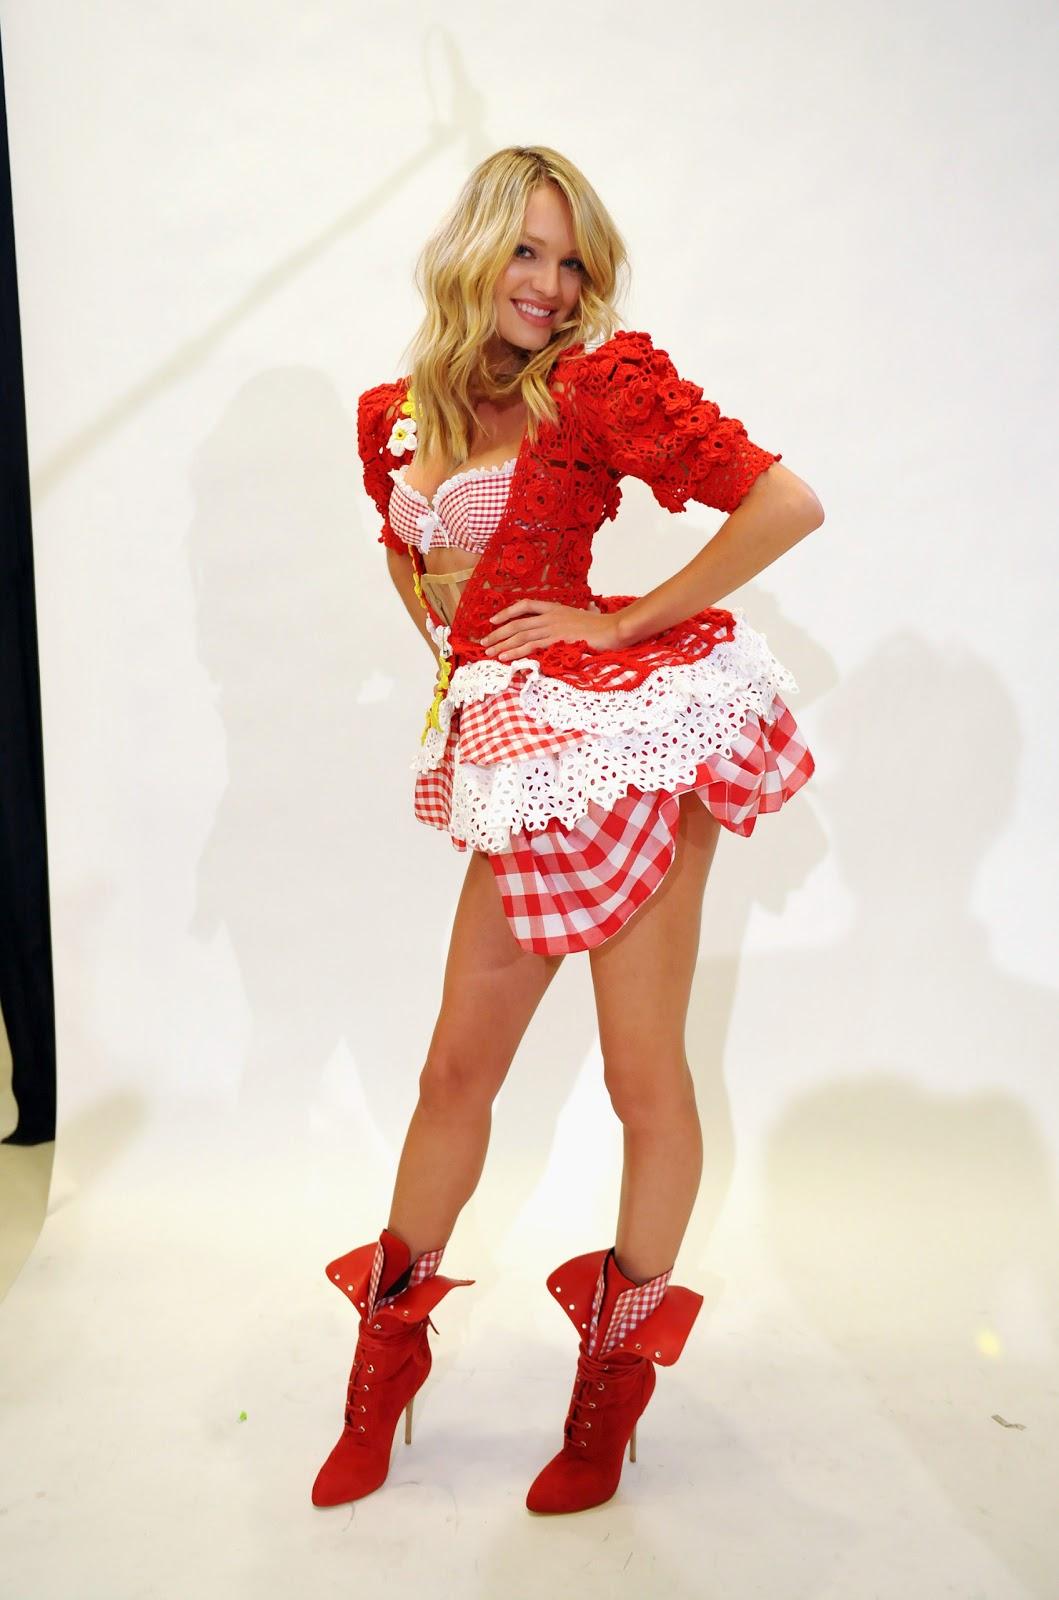 http://4.bp.blogspot.com/_6ryEeuz7sio/TR9-IkM9xvI/AAAAAAAAAIQ/R2E8L87V6h0/s1600/87472_Candice_Swanepoel_Fitting_for_Victorias_Secret_Fashion_Show_November_2_2010_02_122_471lo.jpg